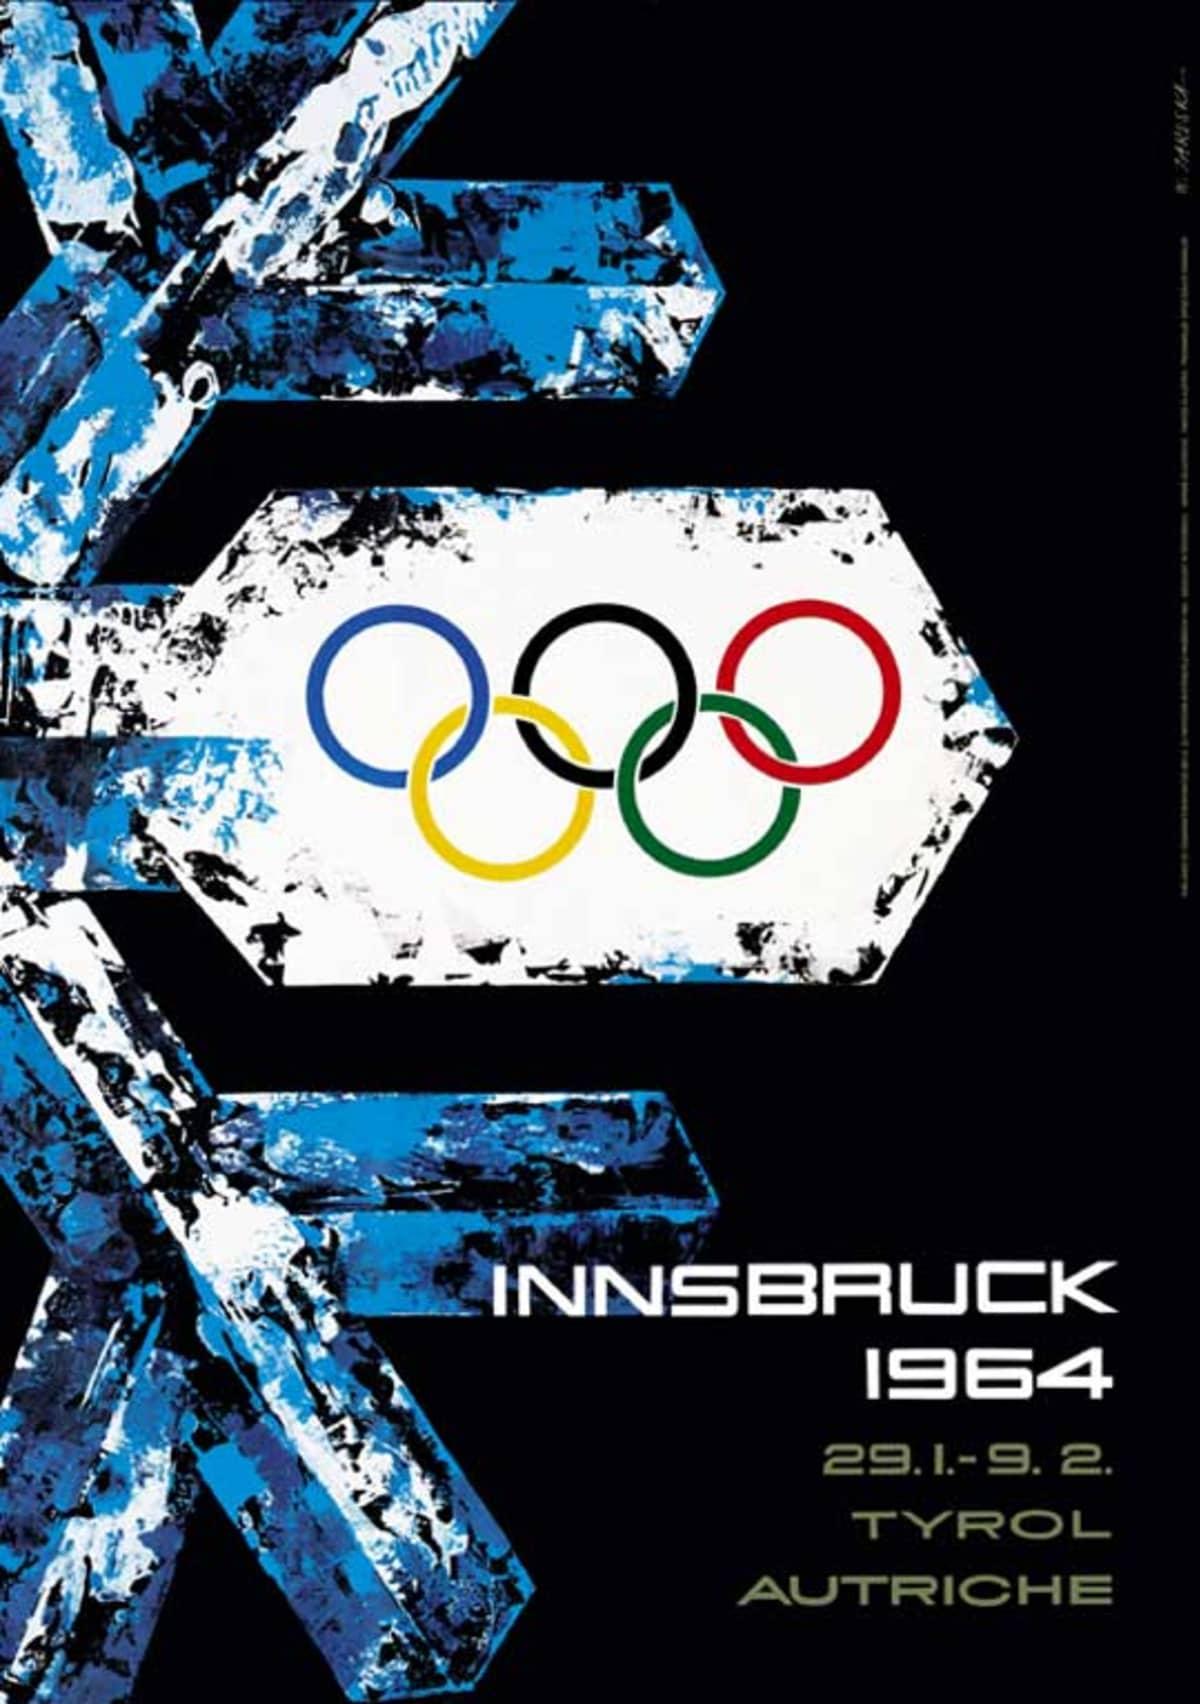 Innsbruckin kisojen 1964 juliste.